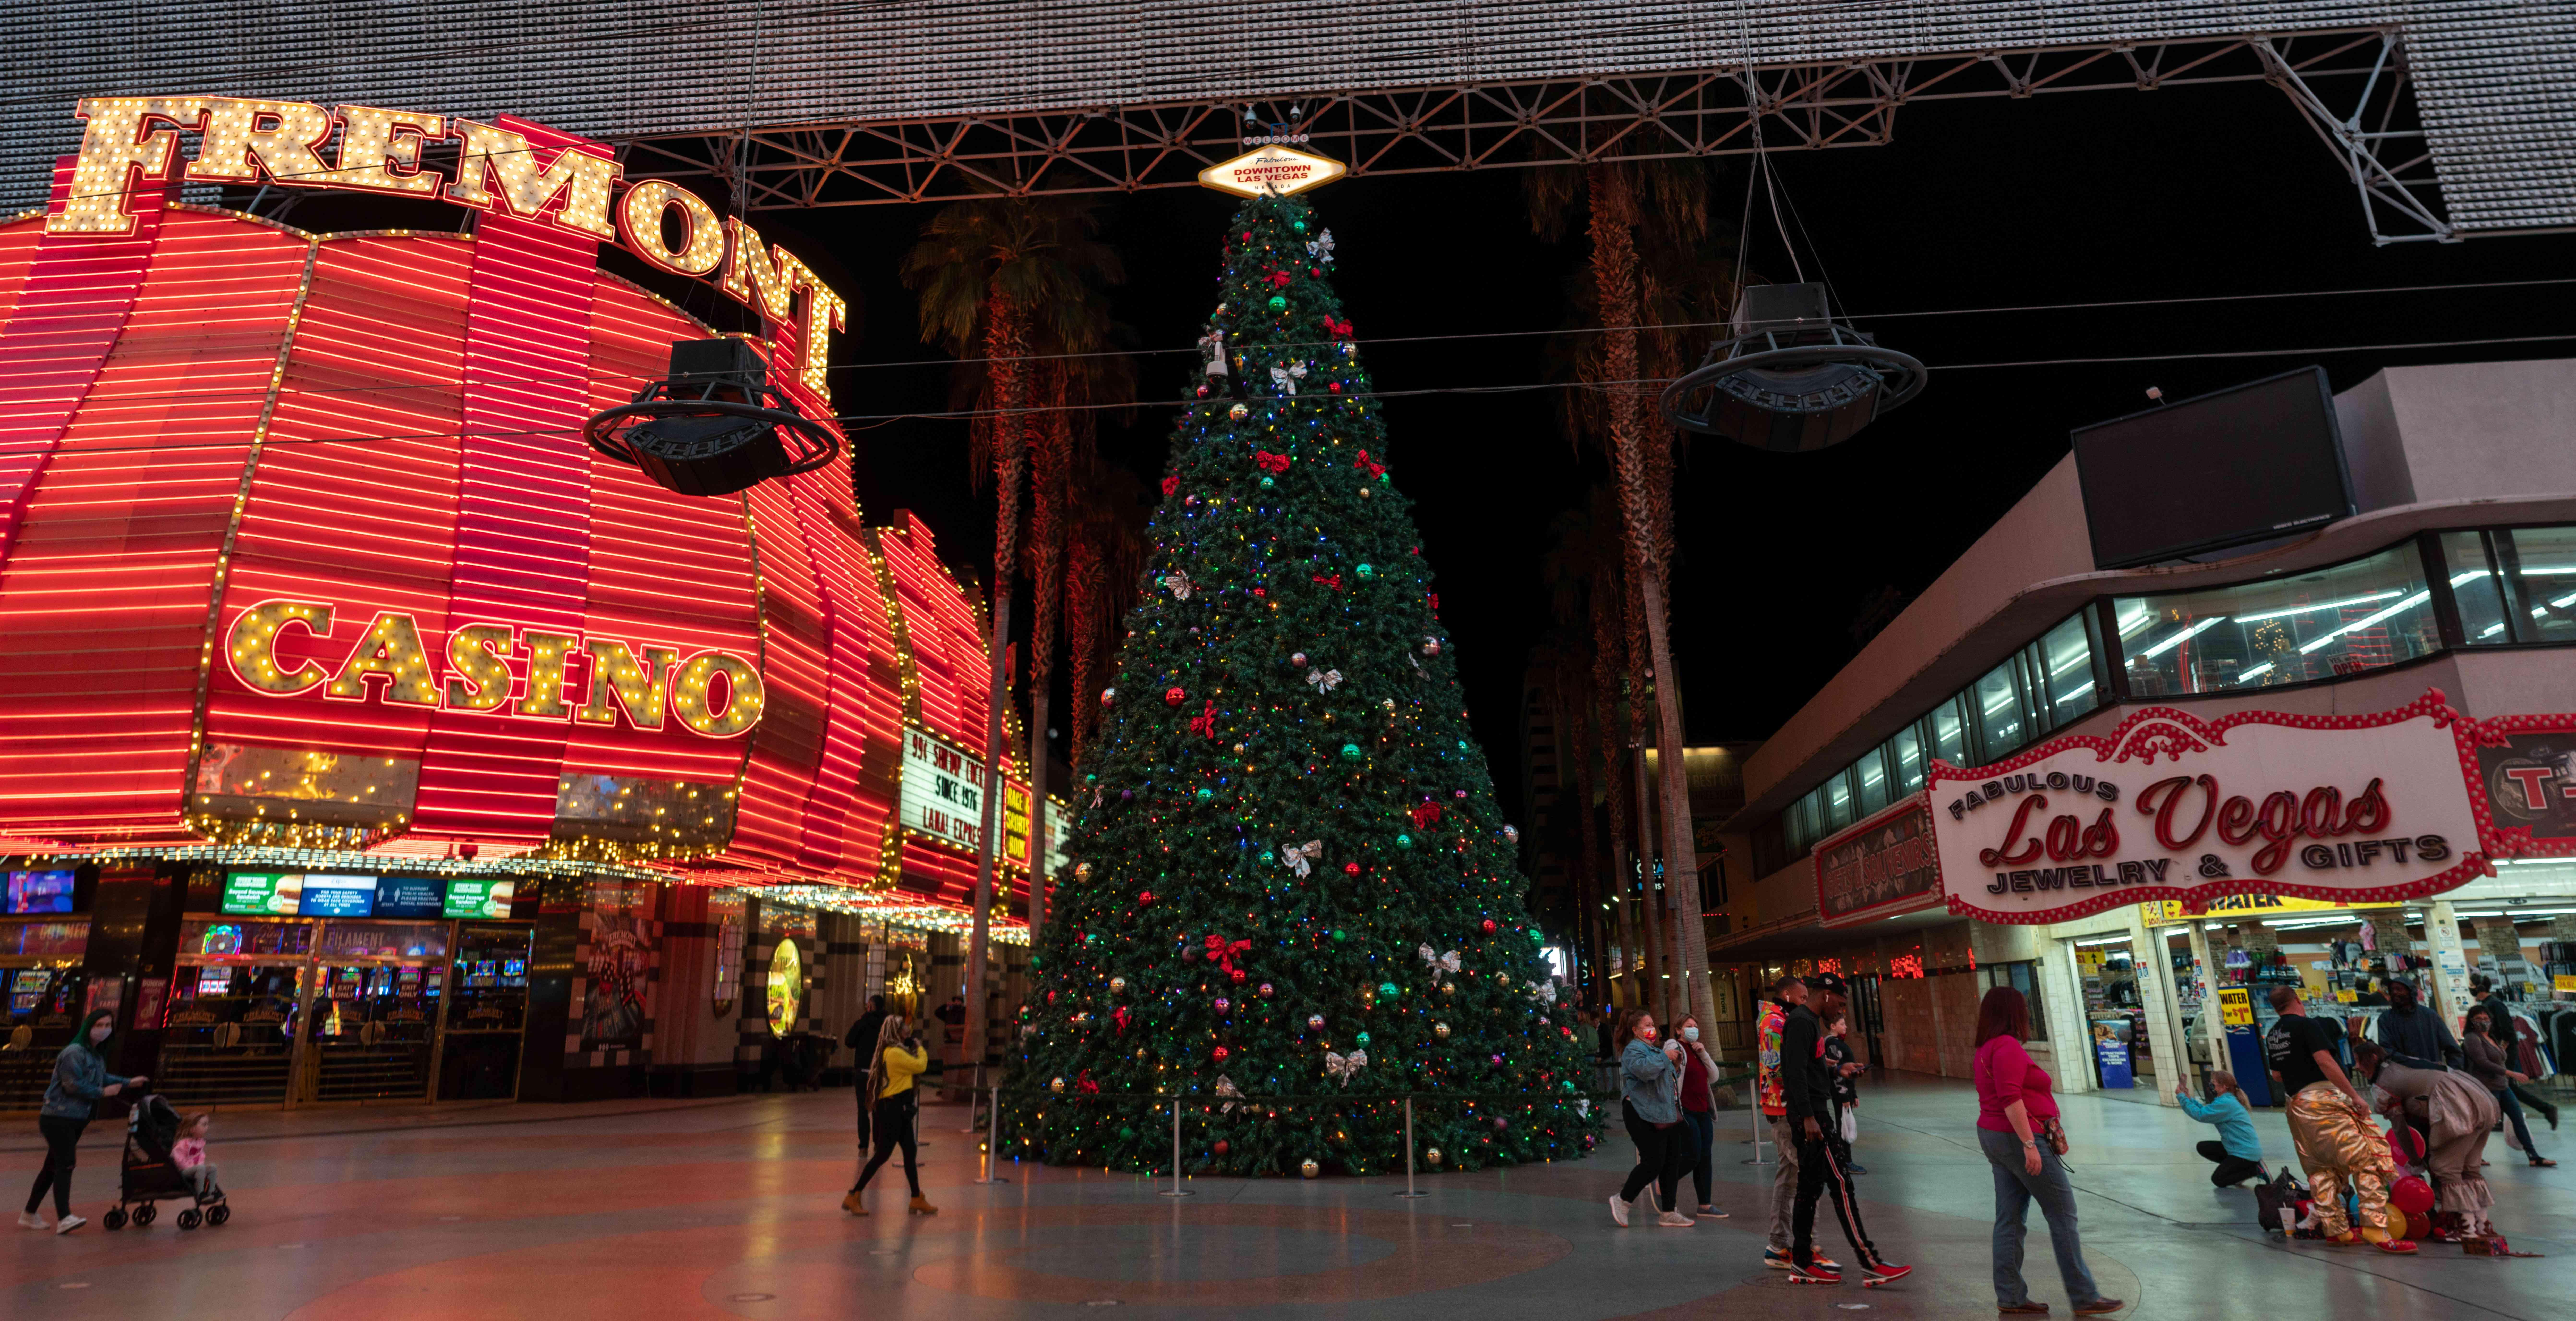 Freemont Street Lights in Las Vegas, Nevada